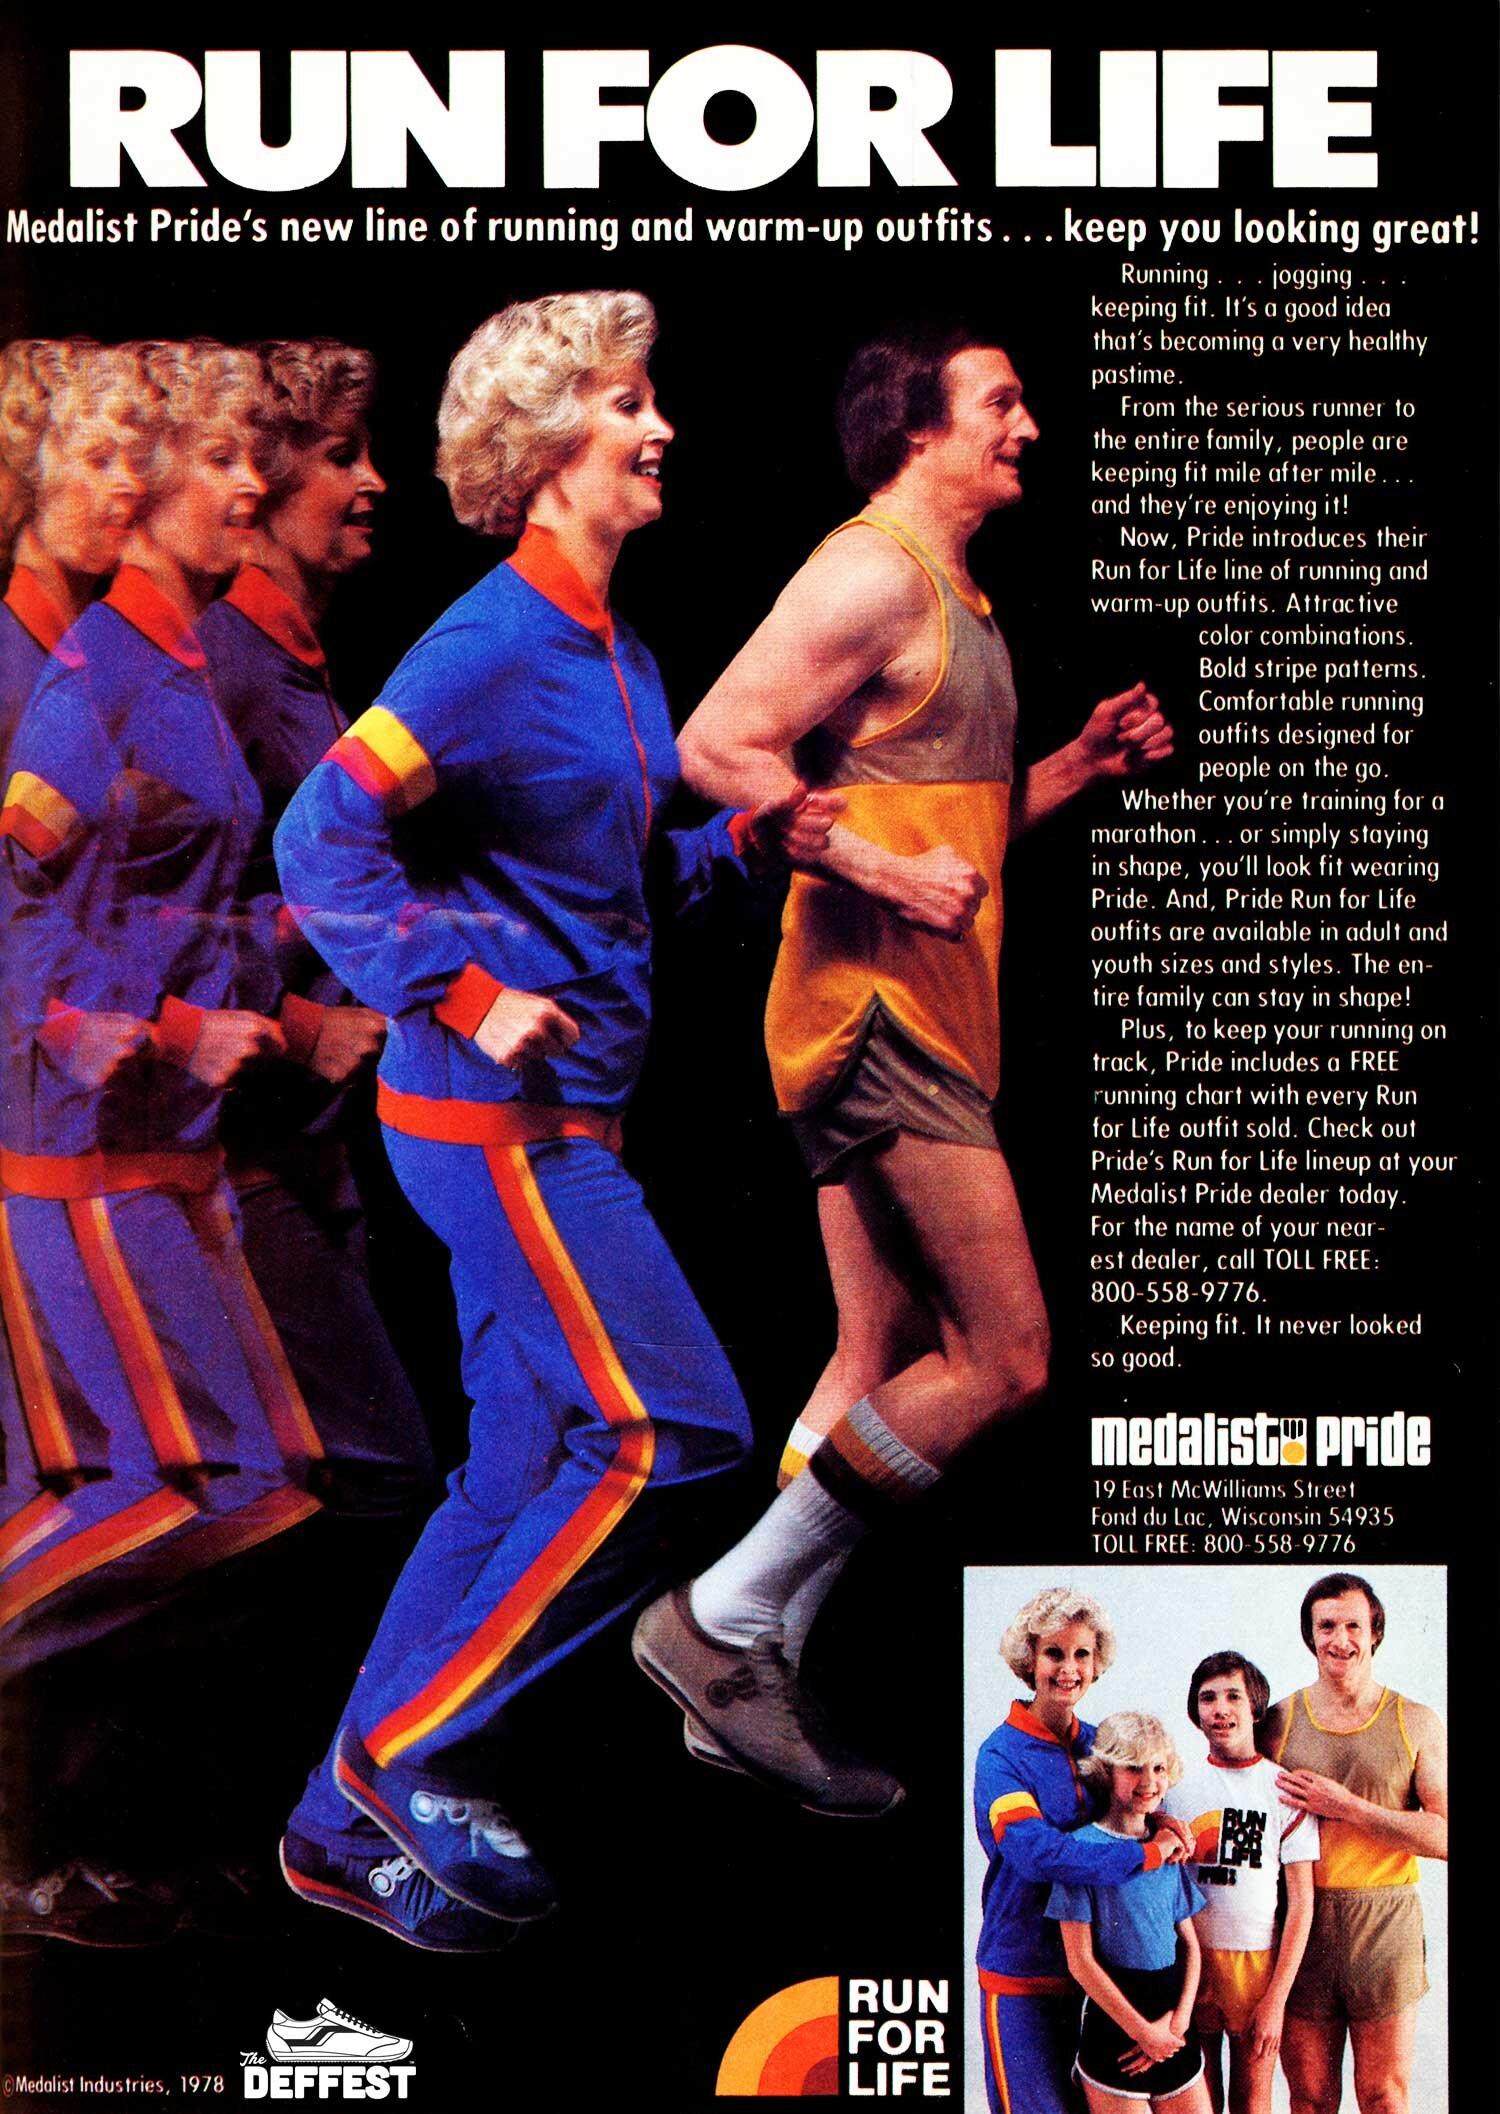 Vintage Running Shoes The Deffest A Vintage And Retro Sneaker Blog Vintage Ads